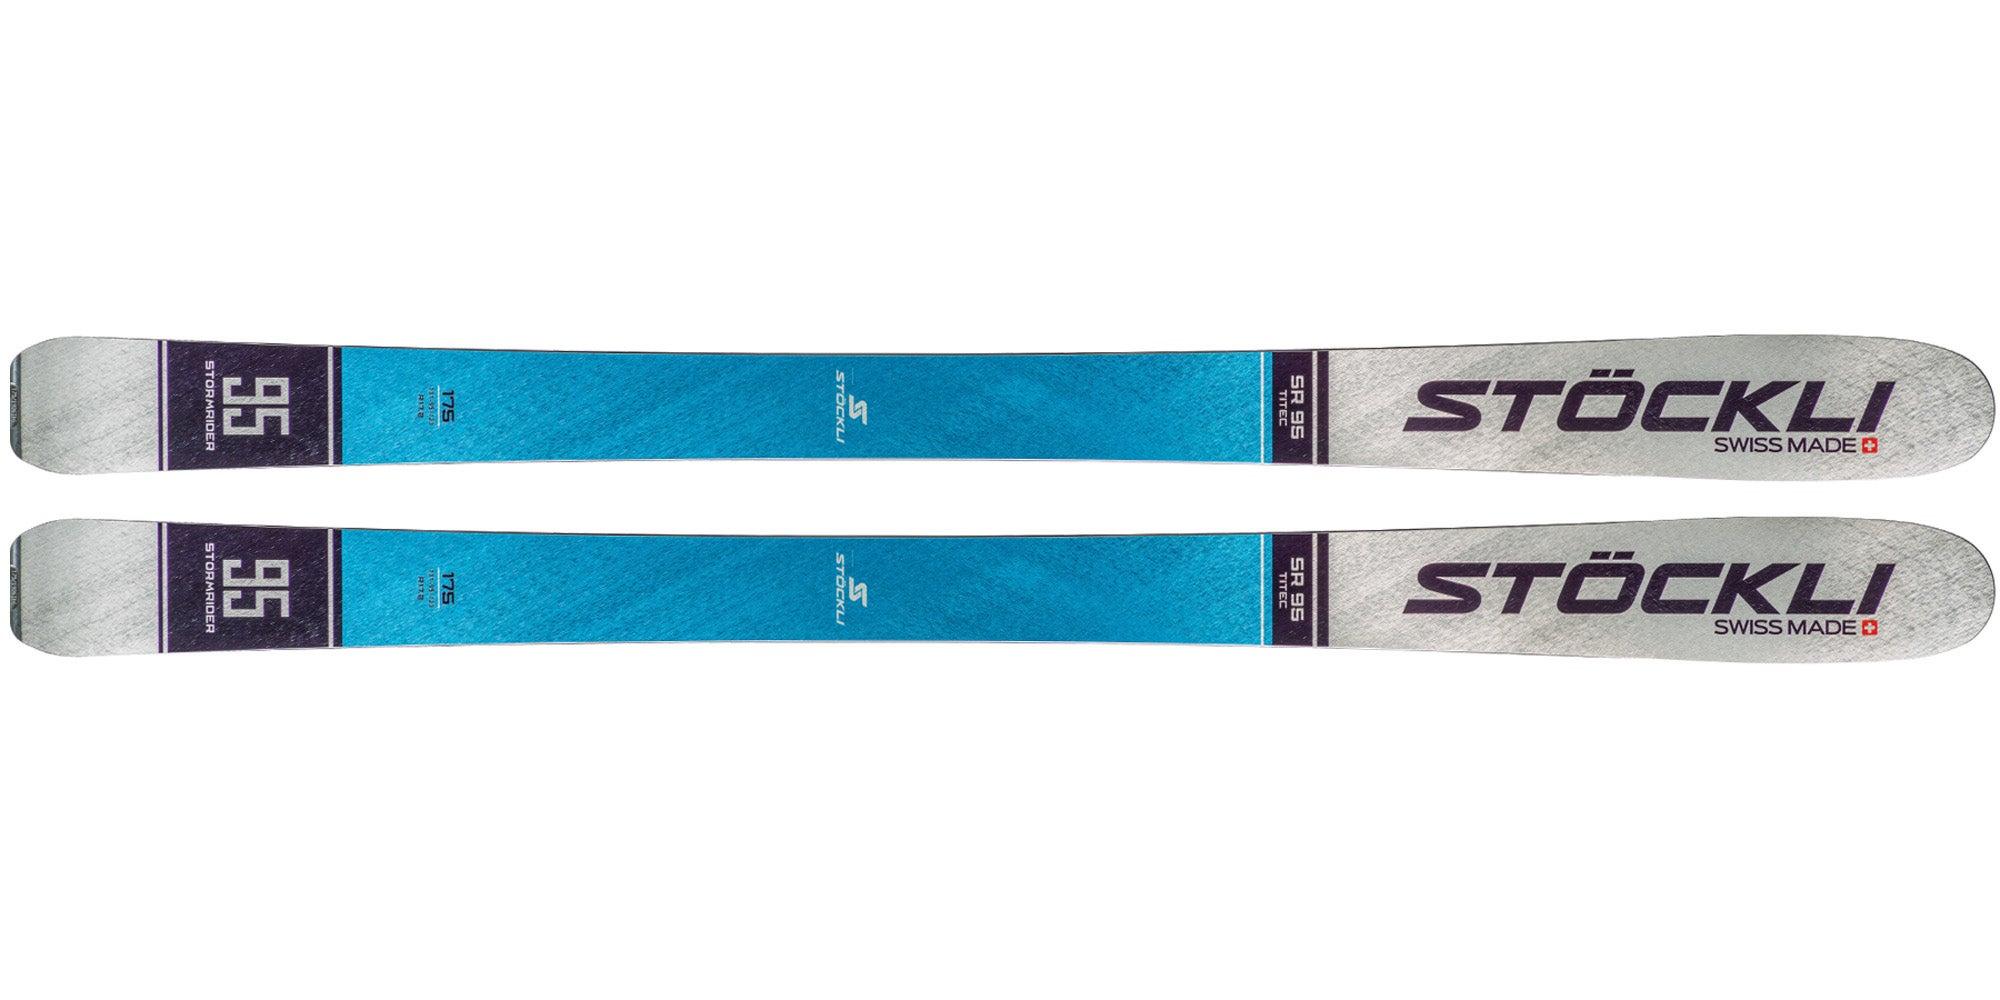 2021 Stockli Stormrider 95 Men's All-Mountain Ski